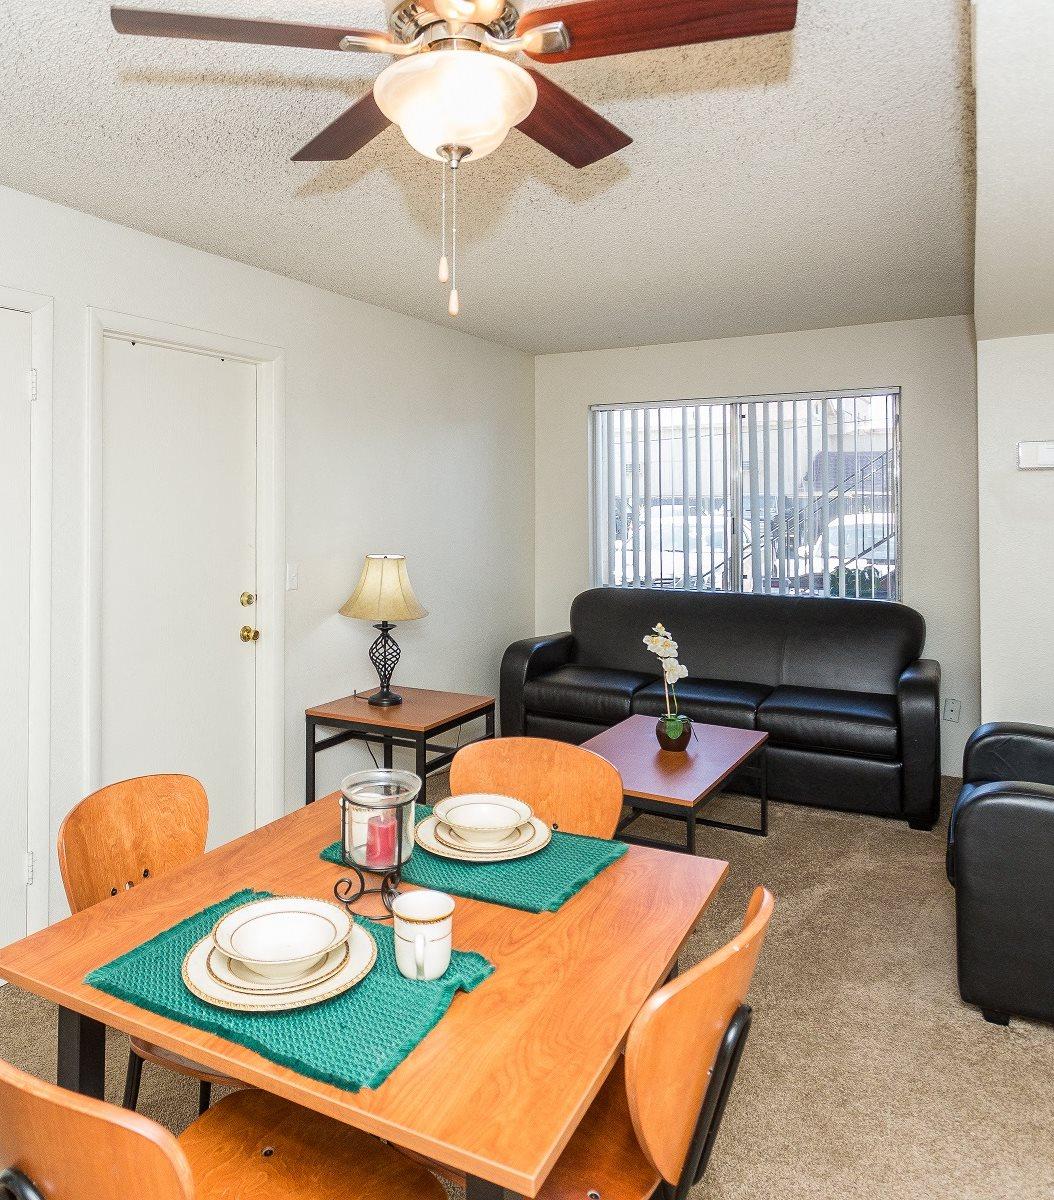 Flagstaff Apartments